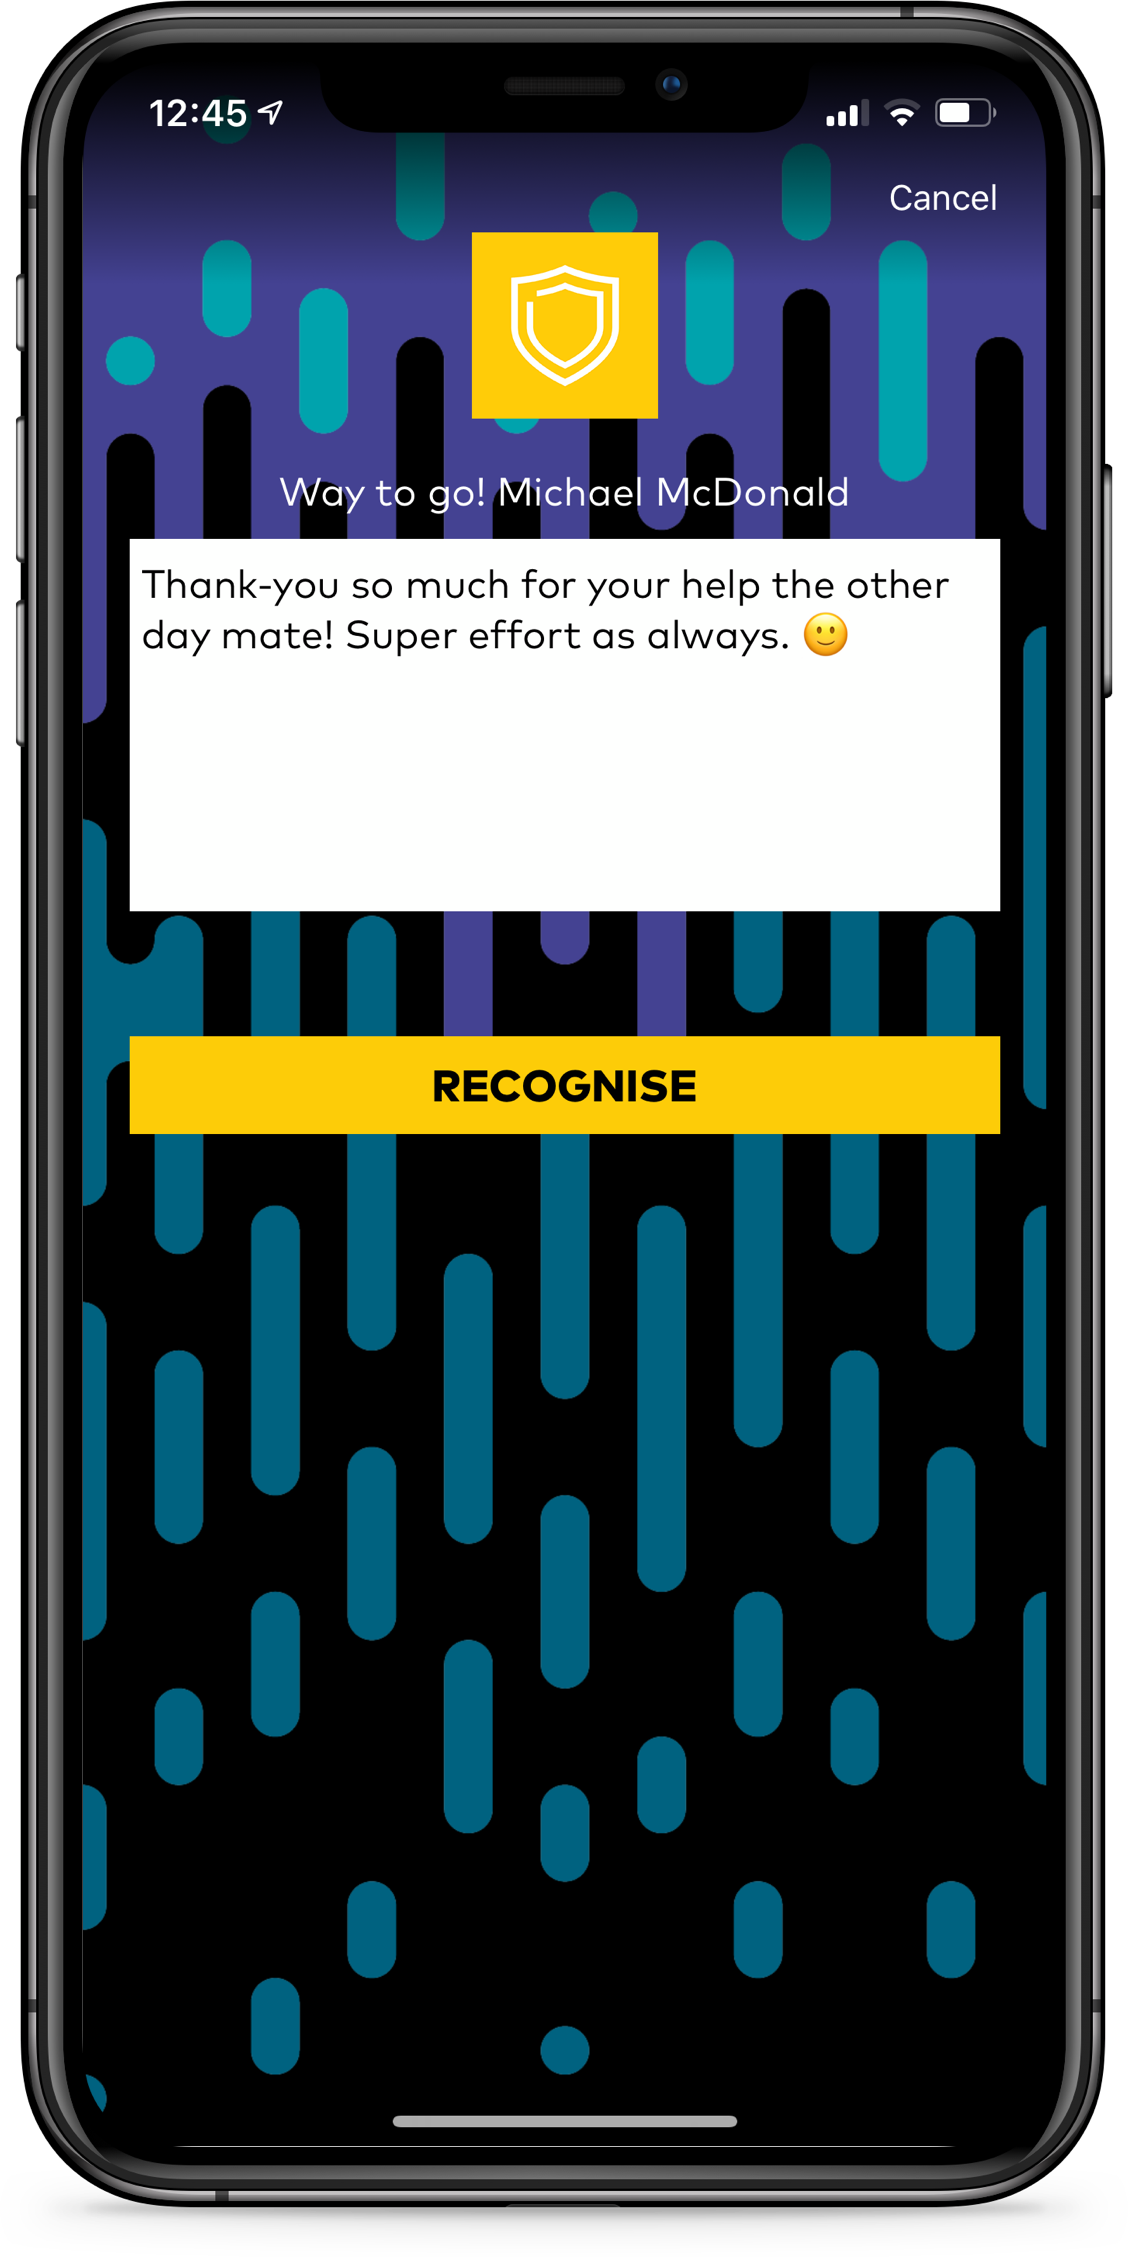 RewardCentre App Image 2